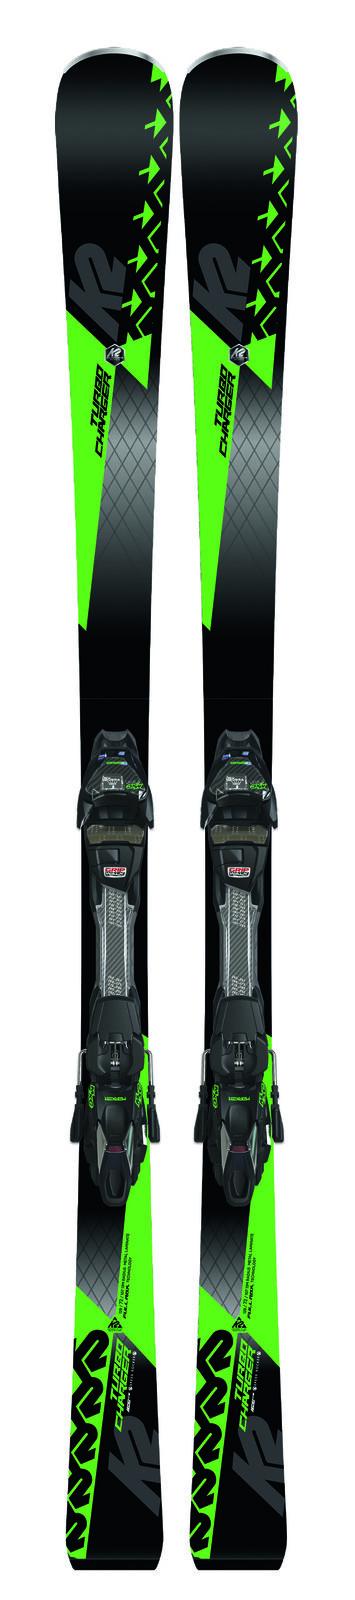 K2 alpinski set sci  legiocoTurbo Charger Charger Charger  MXC 12 TCX LIGHT quikclik f5a